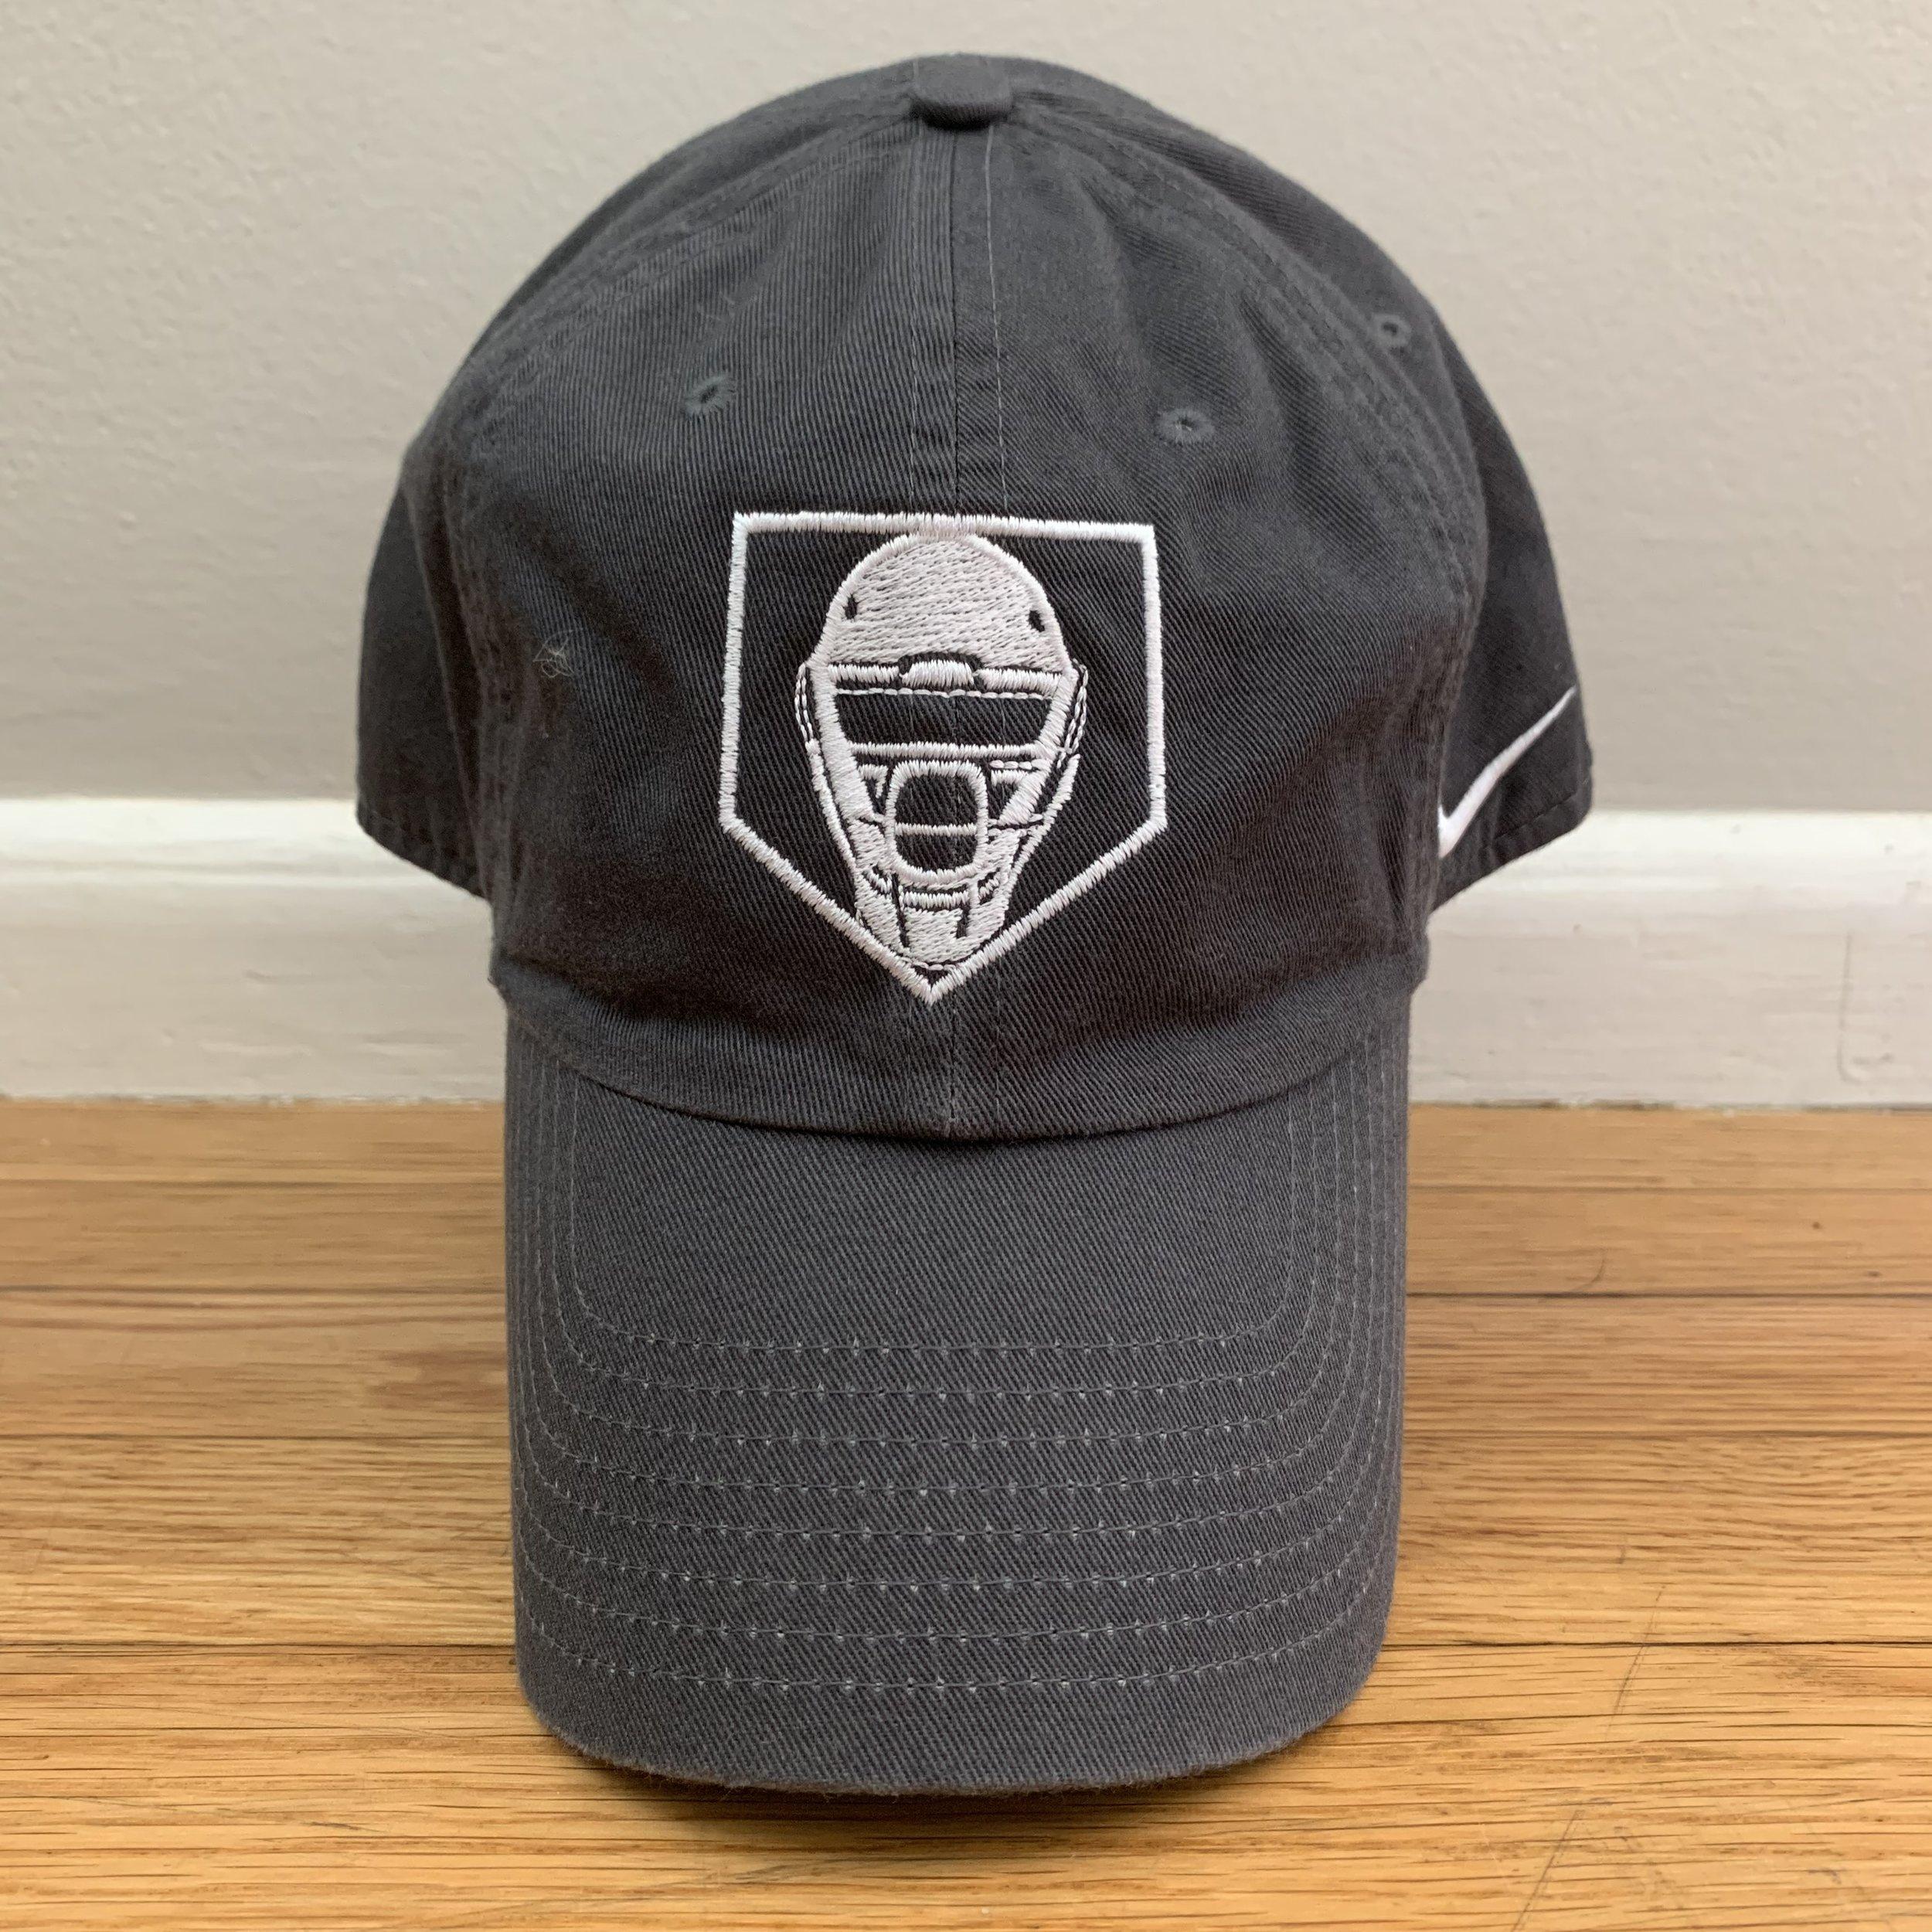 Cotton Hat w/ Buckle Back – Grey  $20